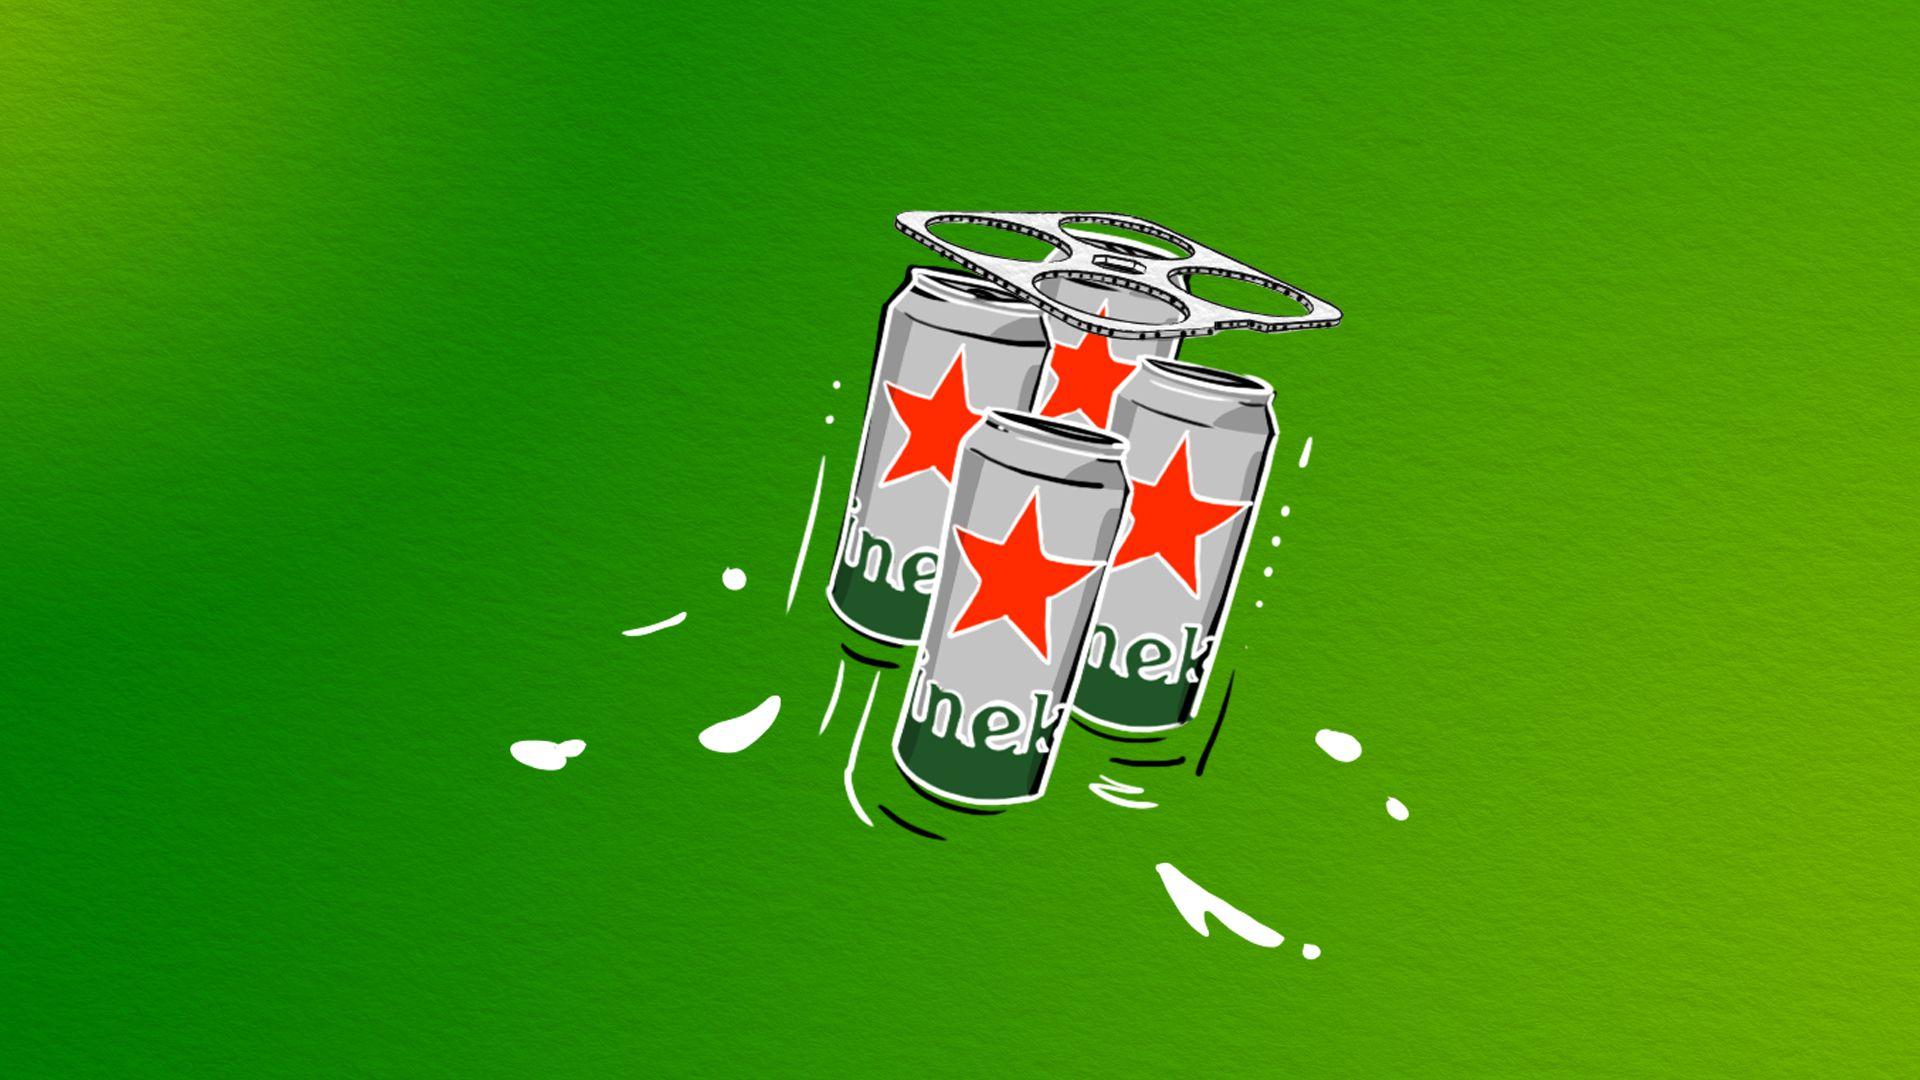 Illustration of Green Grip